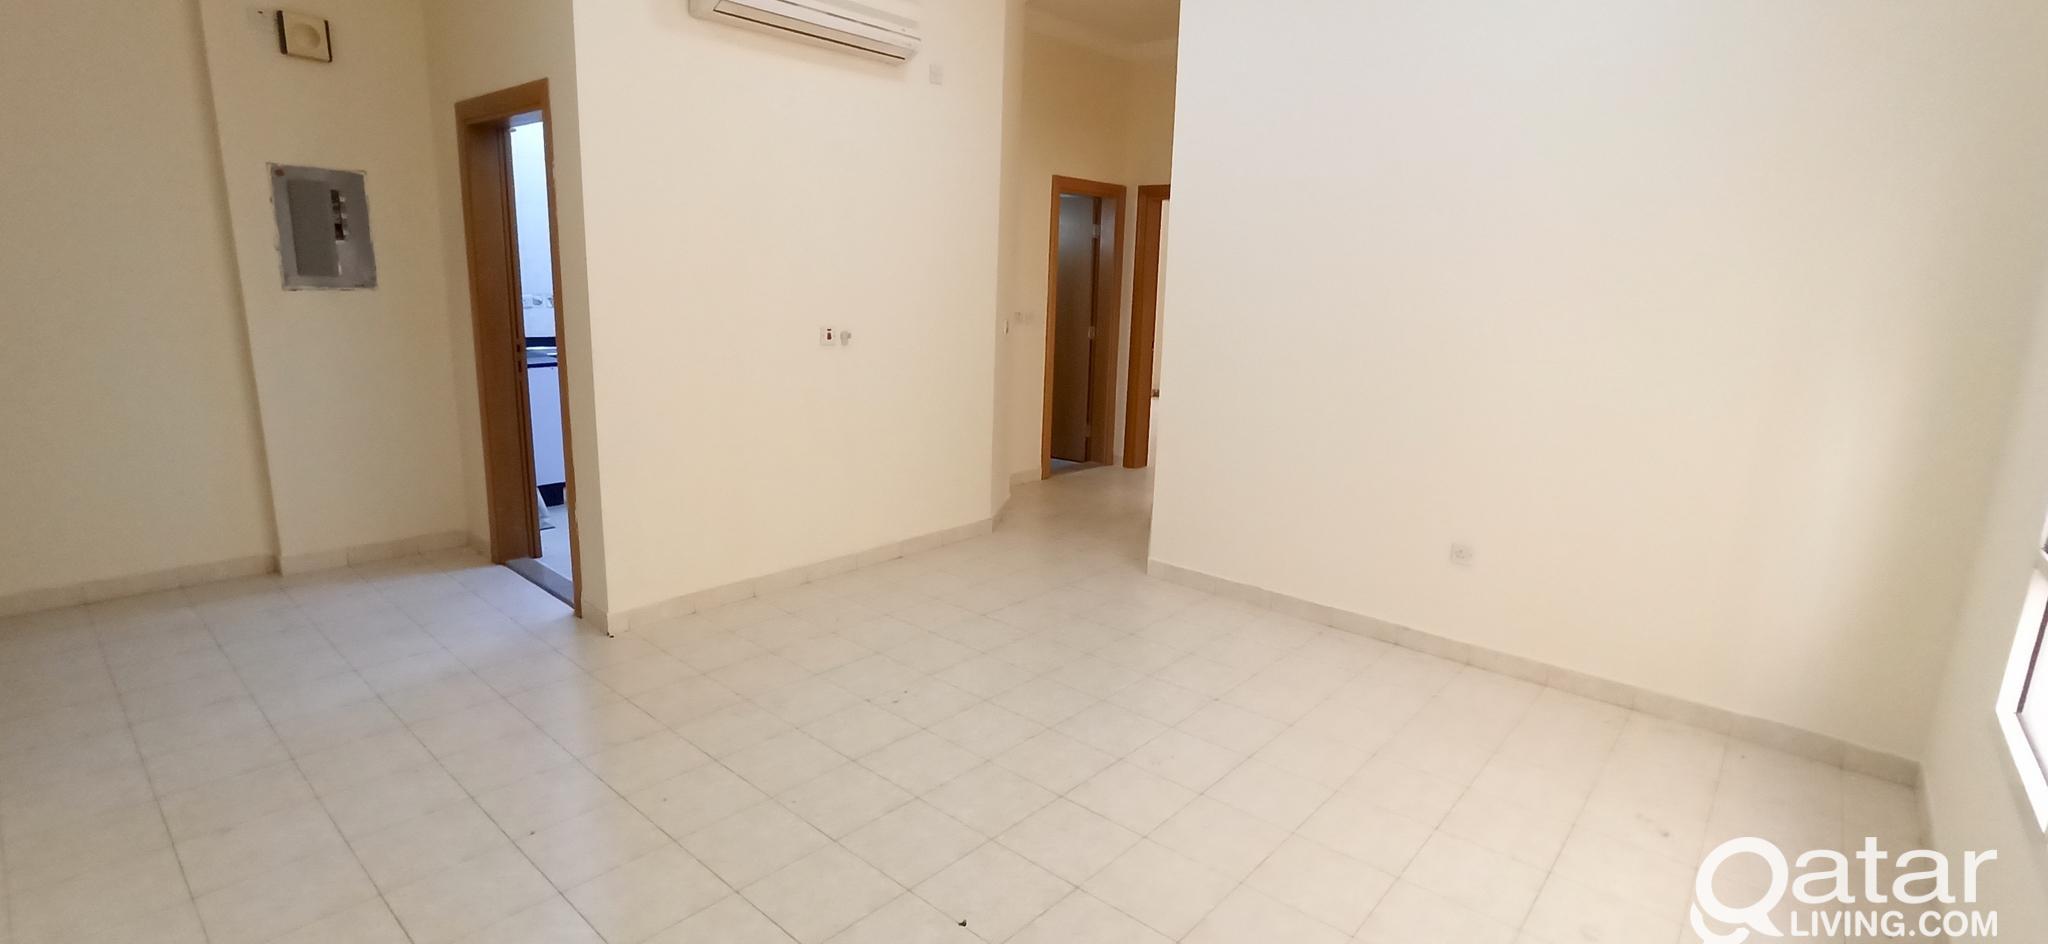 Cheapest 3 Bed Apartment near Waqood Muntazzah (No